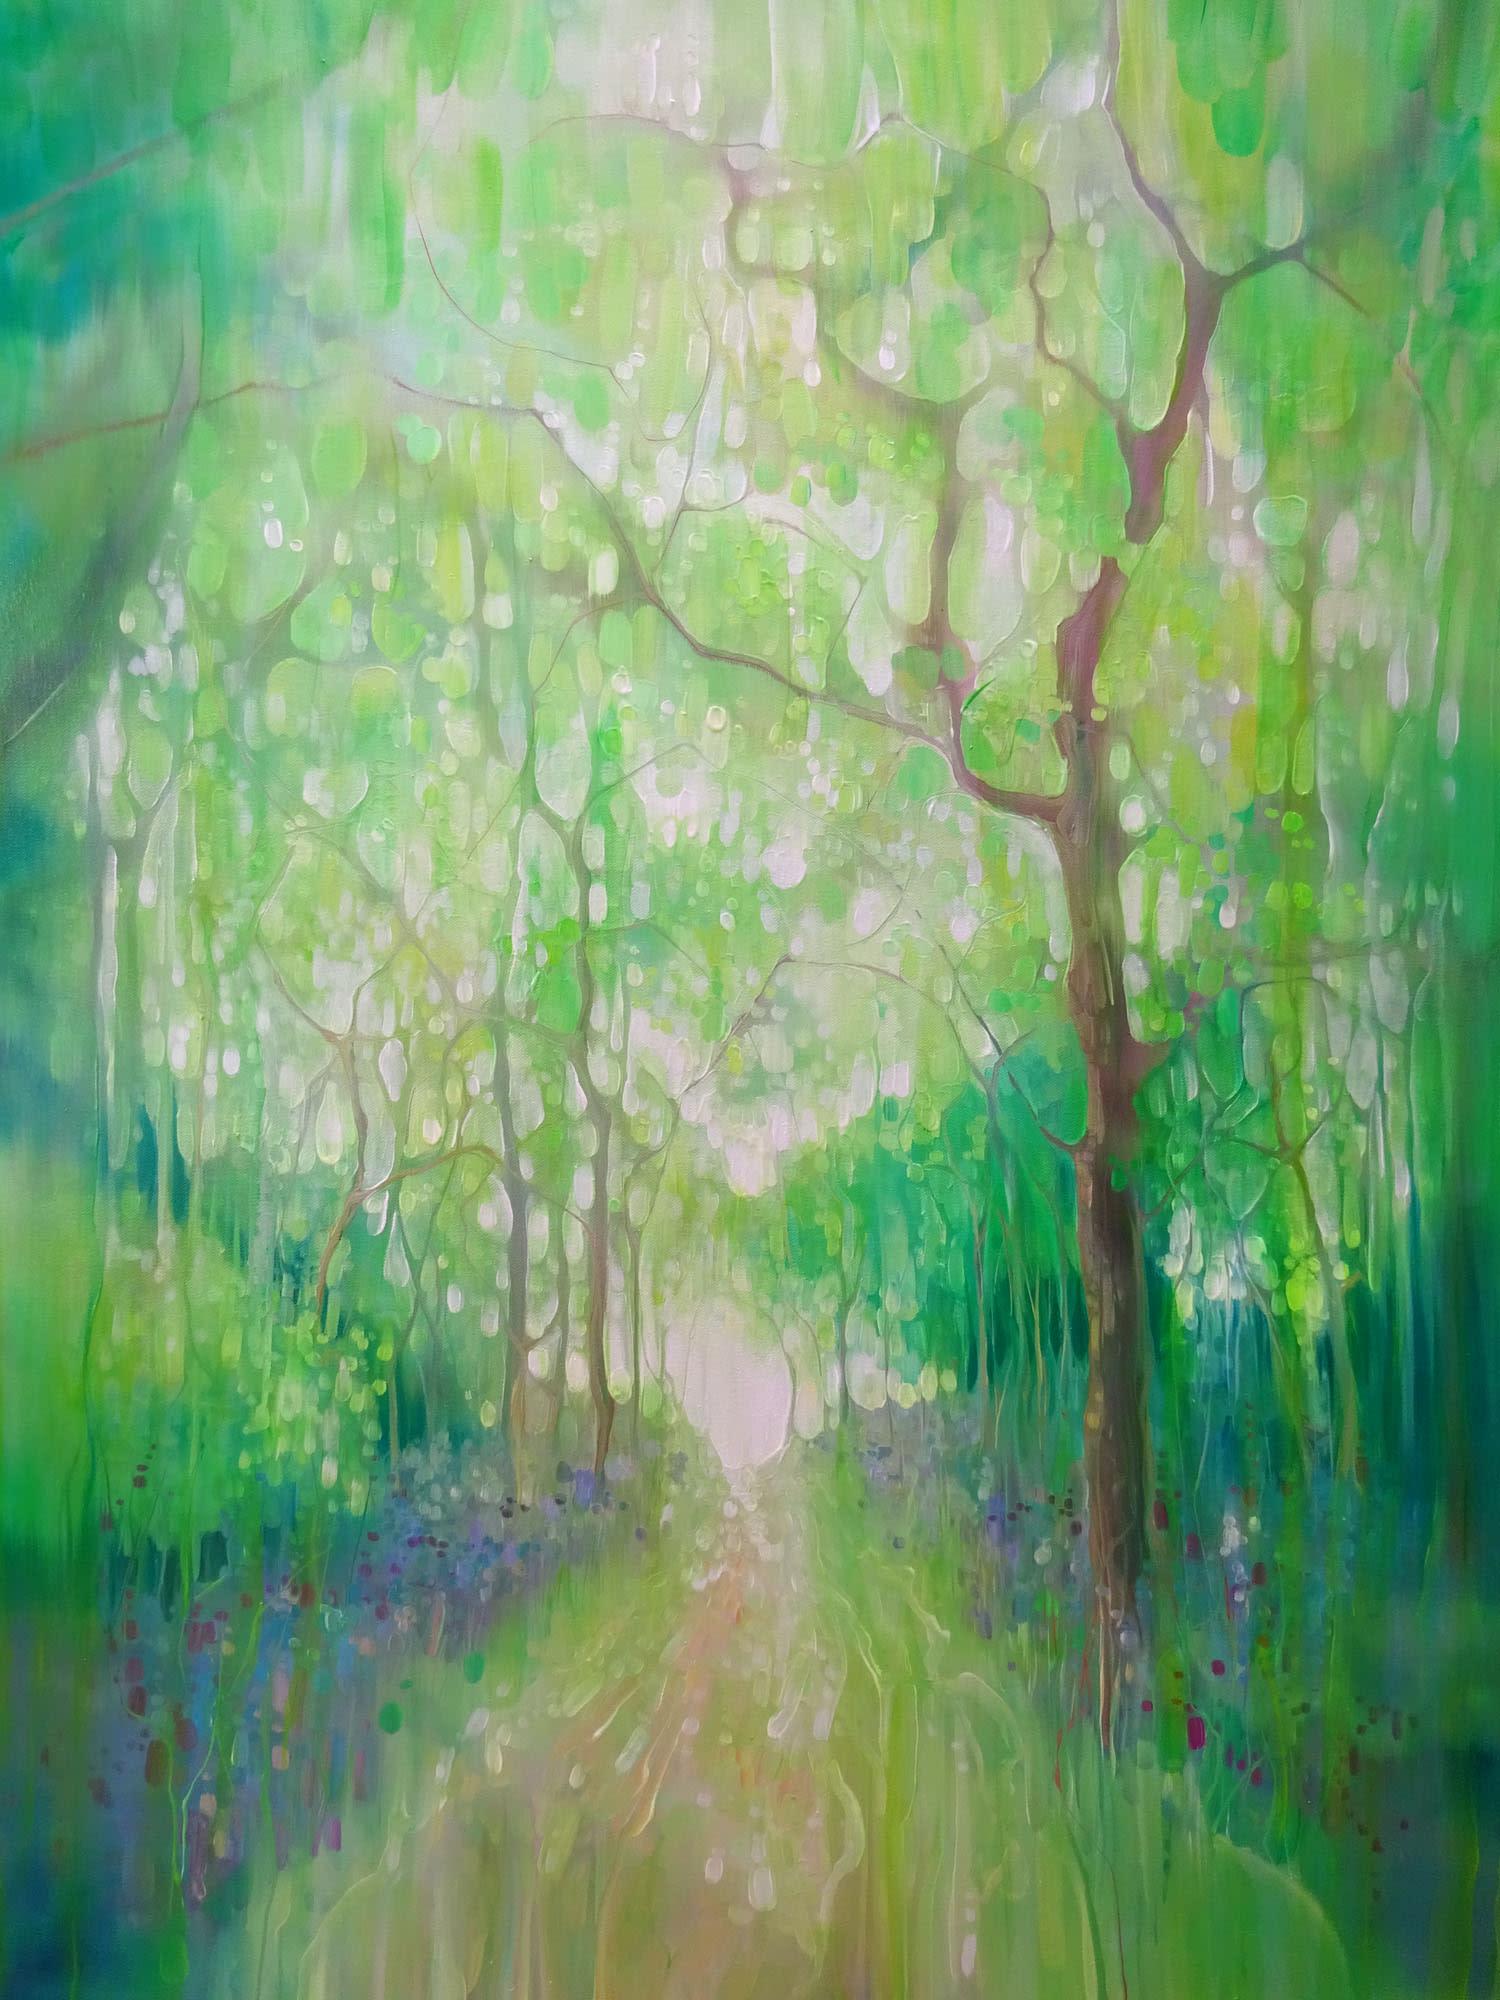 Green forest calling d1 2 npwvdn